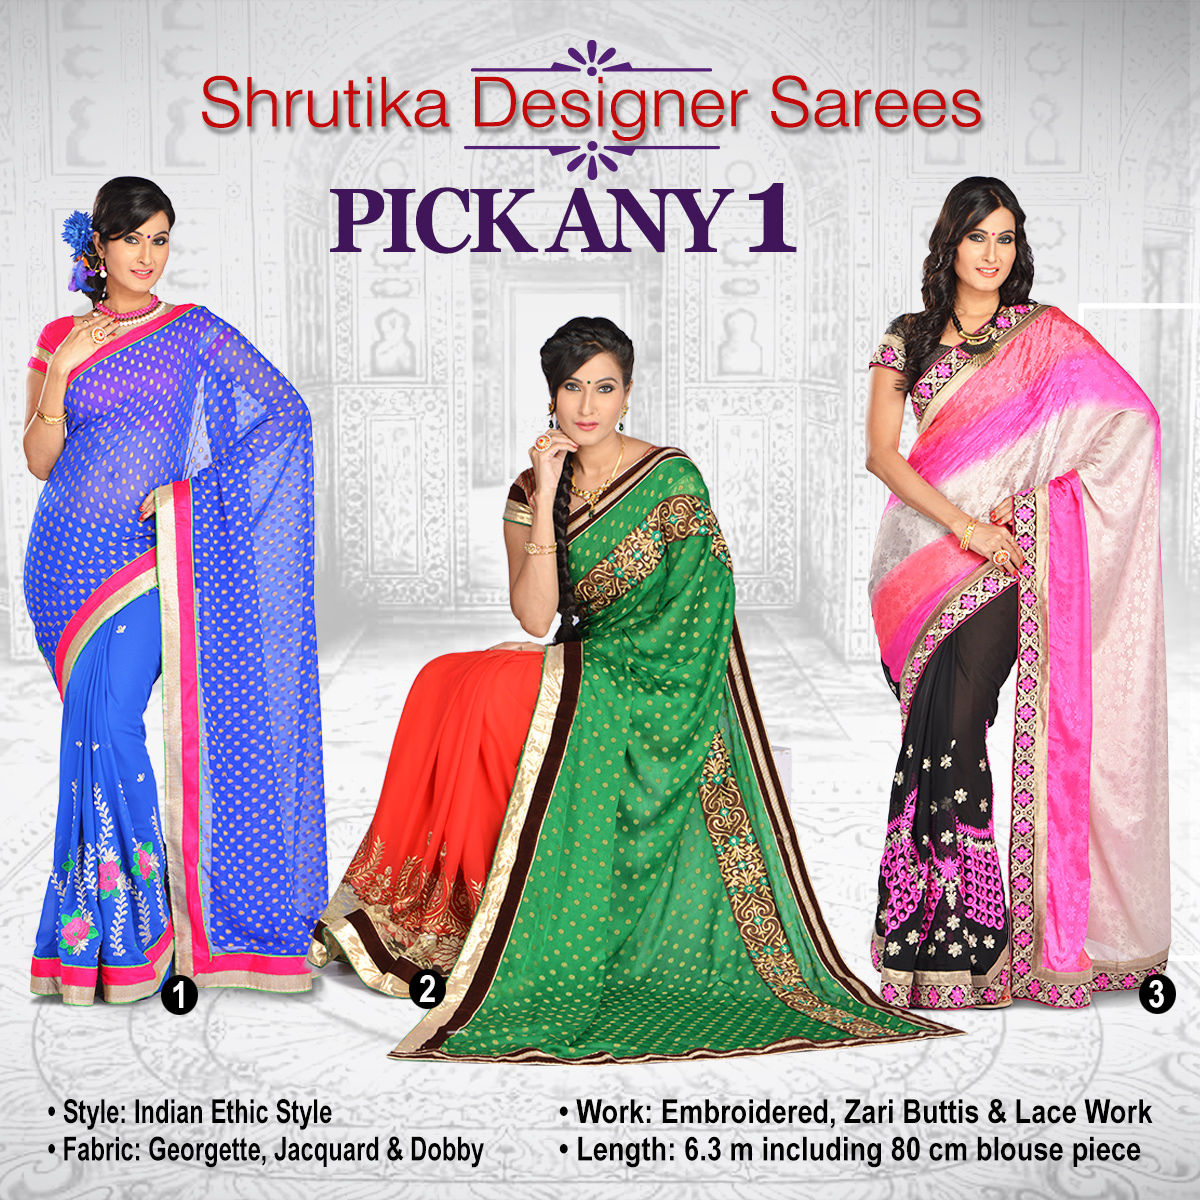 e45ef00384d Buy Shrutika Designer Saree - Pick Any 1 Online at Best Price in India on  Naaptol.com